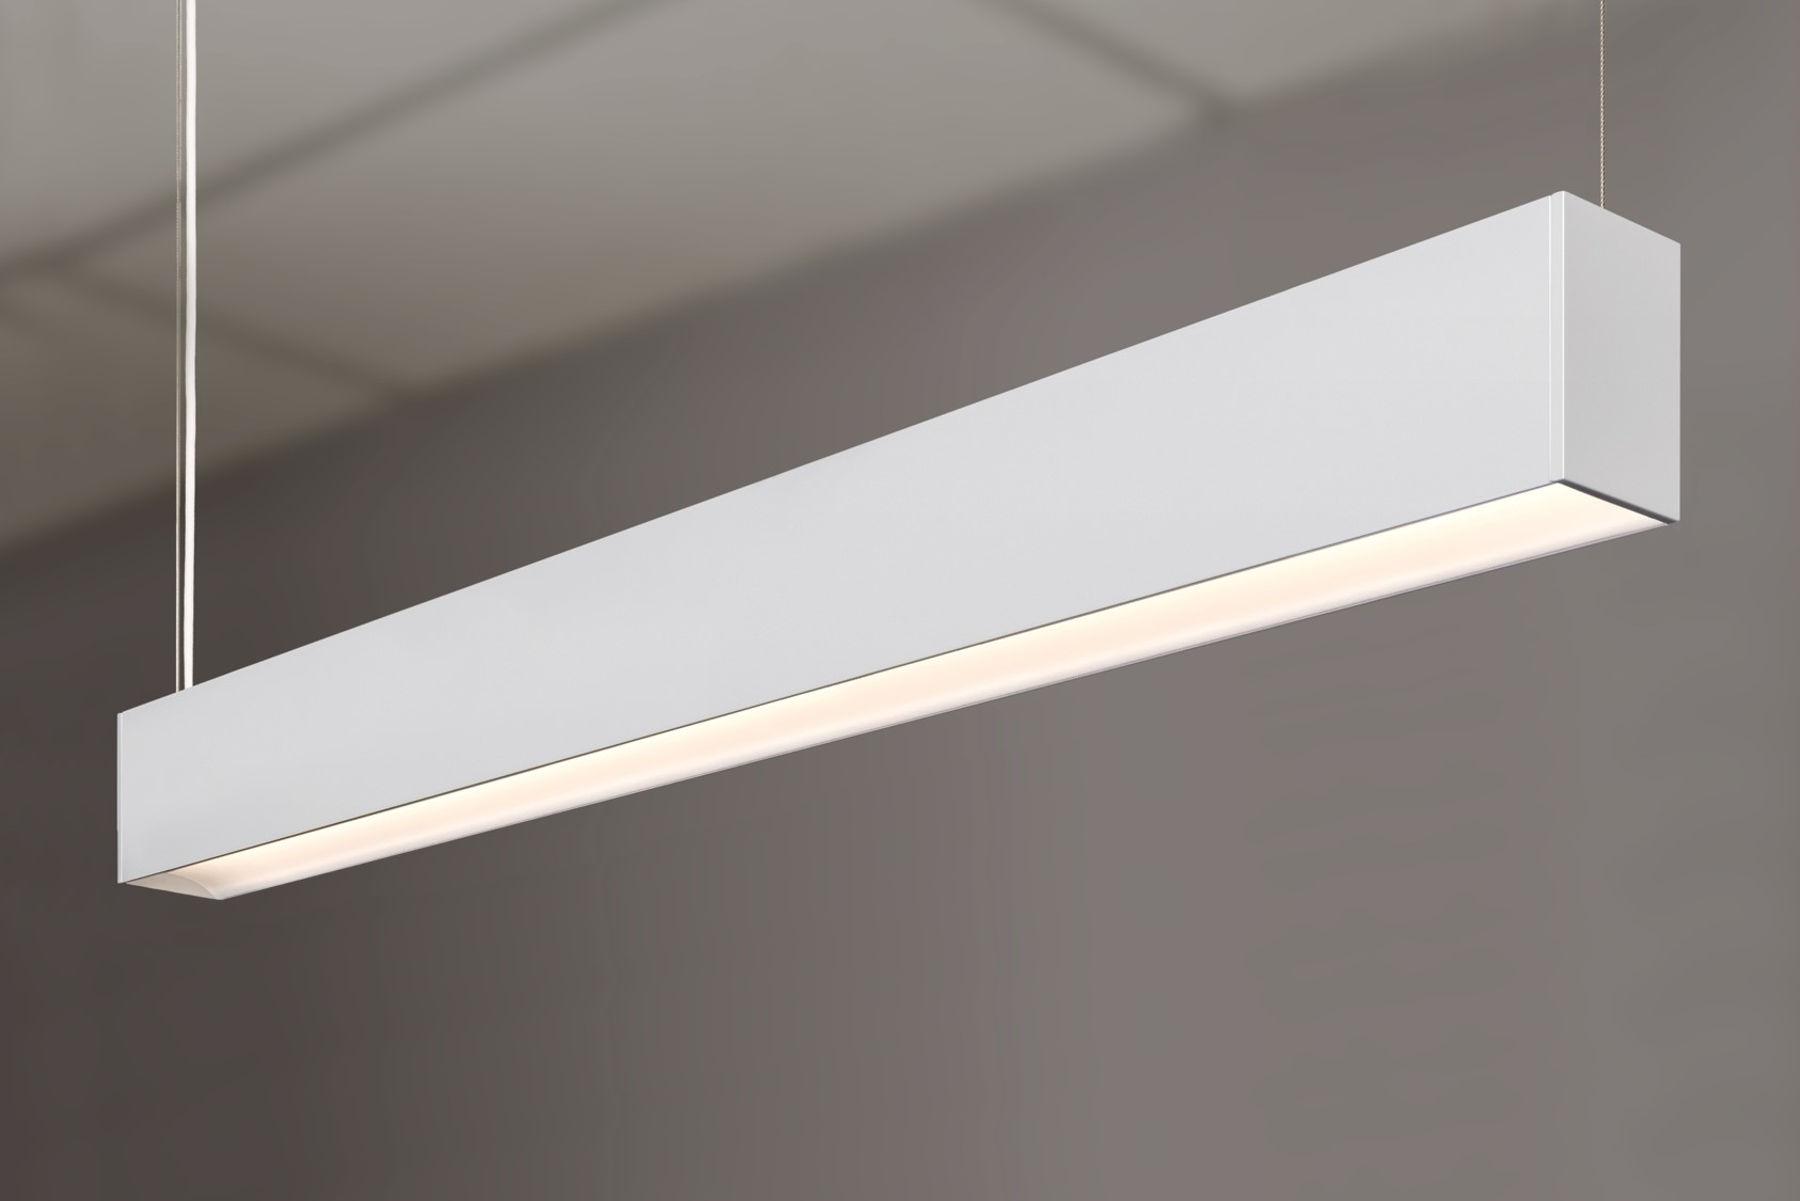 Picture of GB35D2FE-LED-LENSCC.6